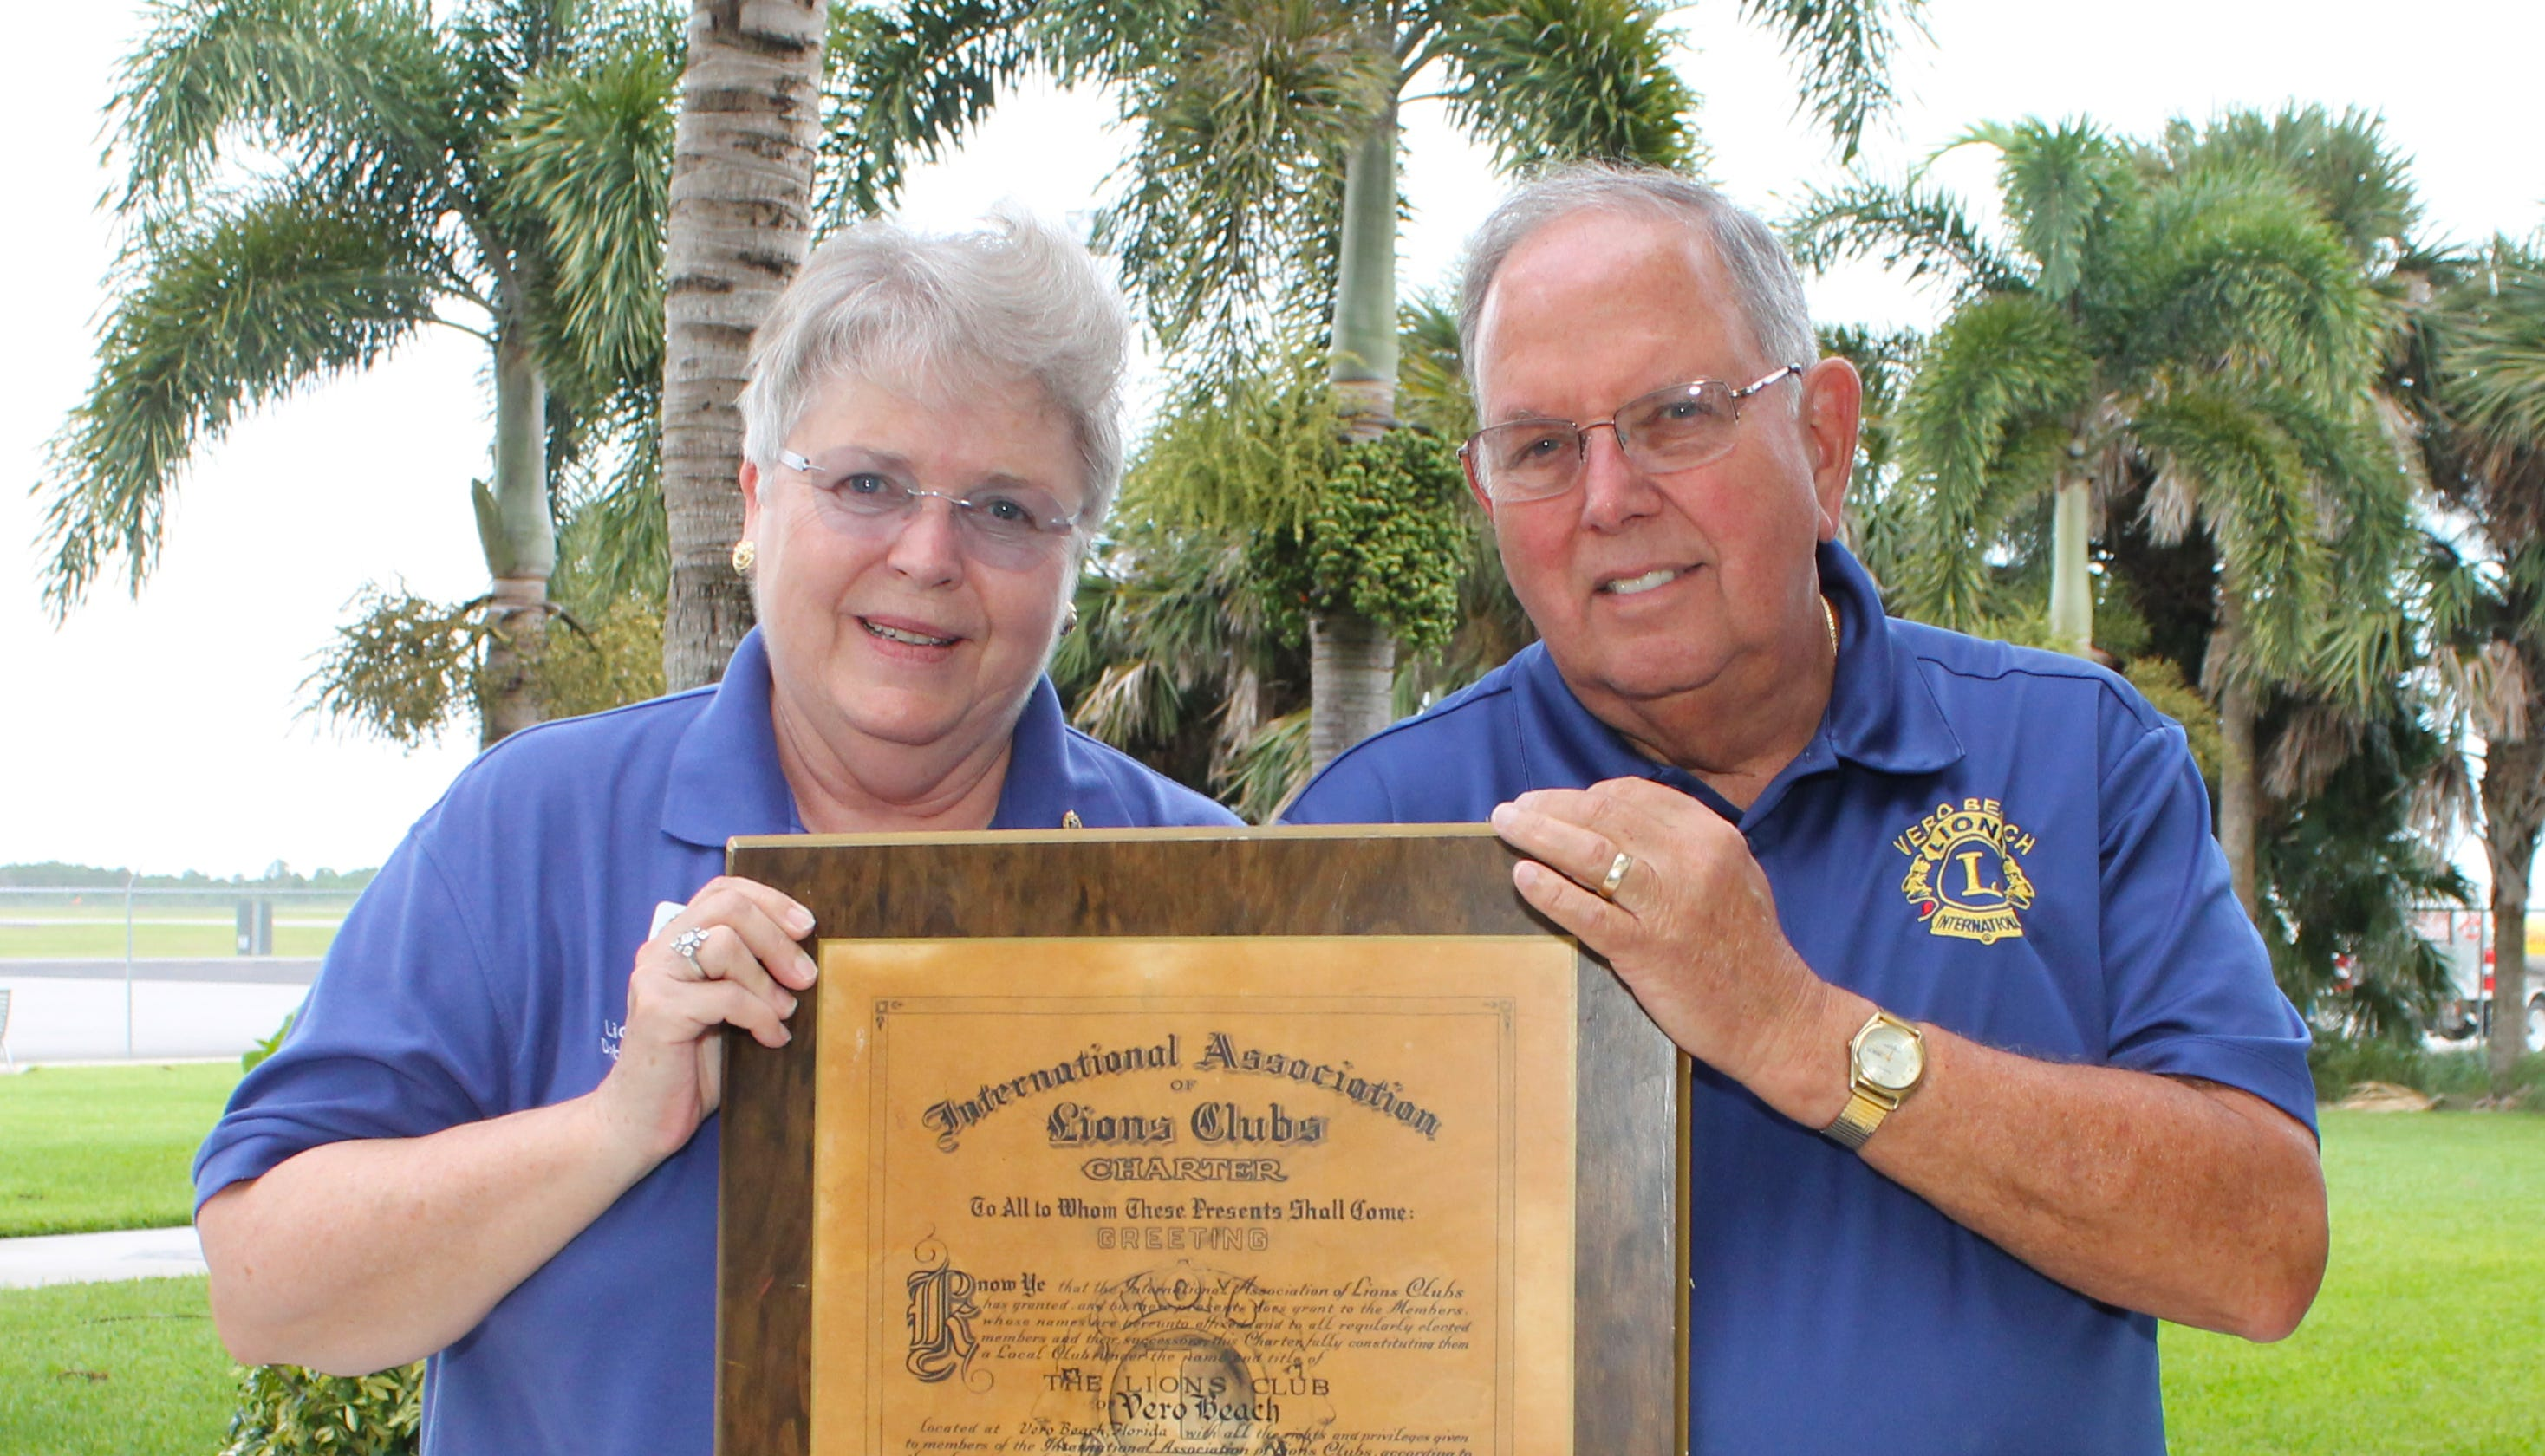 e7901b41f5ec Vero Beach Lion s Club has been serving the community for decades